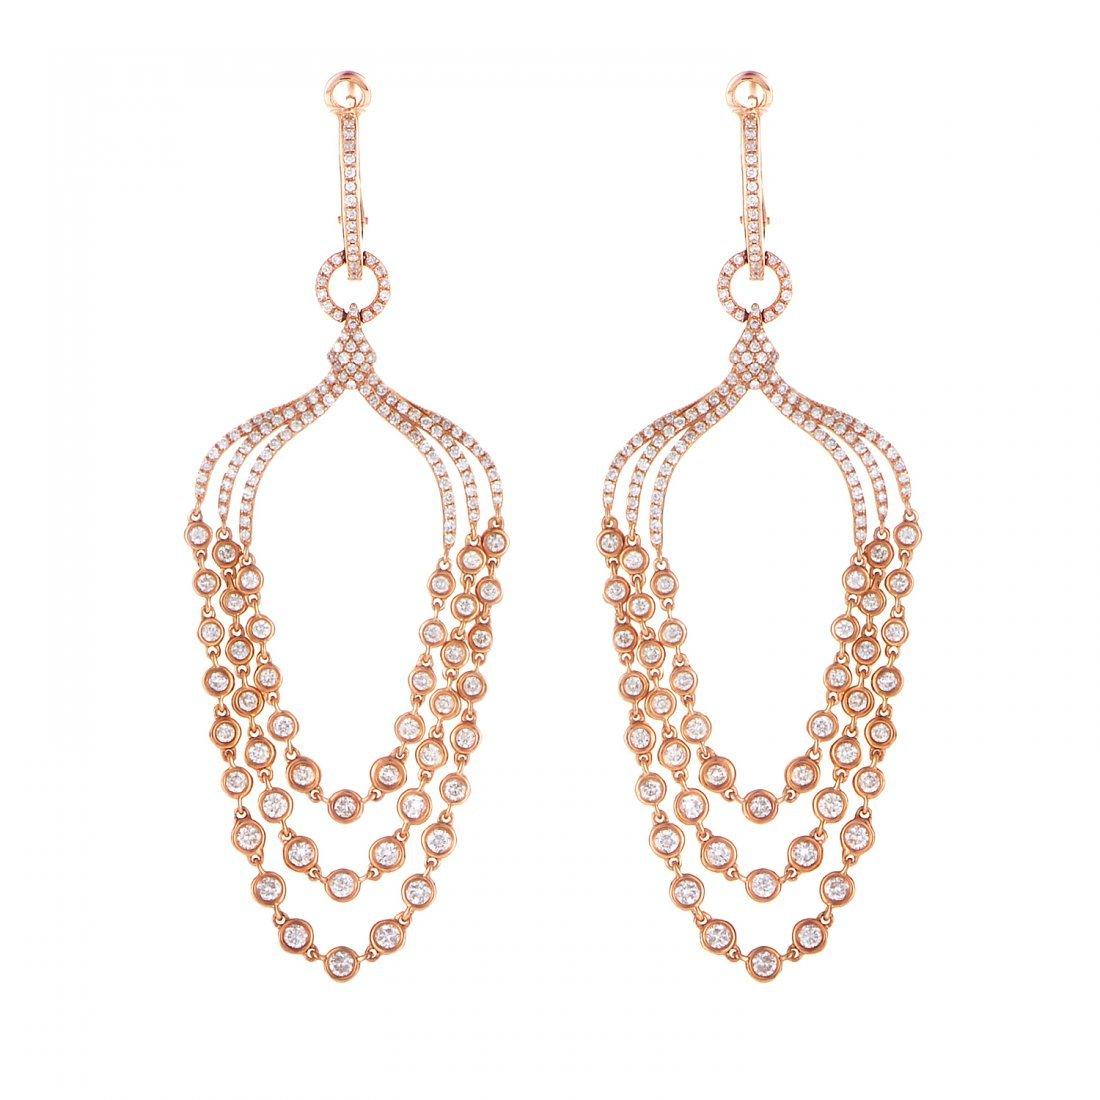 18K Rose Gold Diamond Drop Earrings SEDF868EERZ